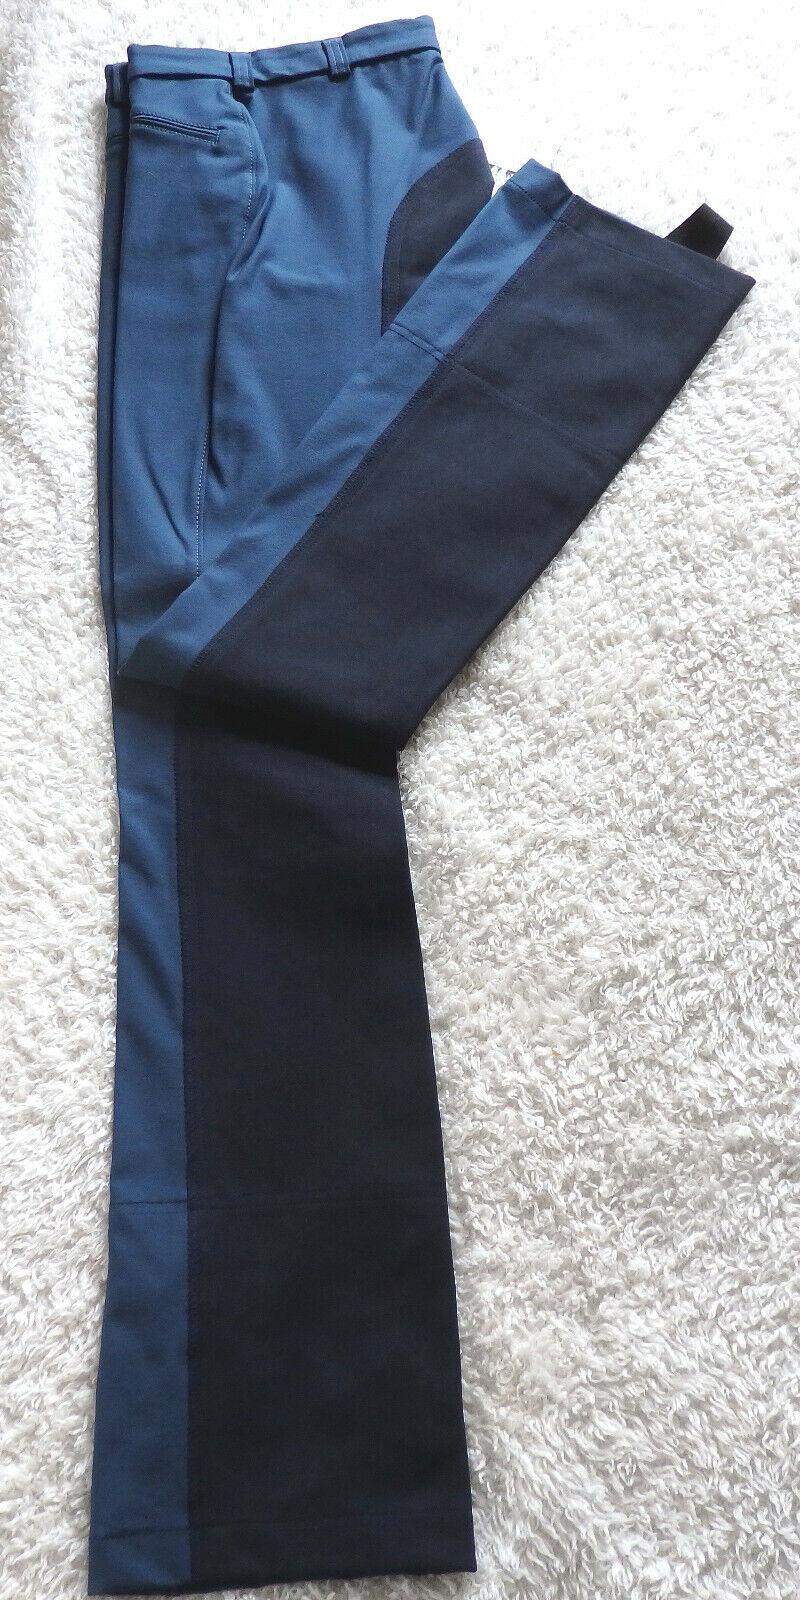 BarouxCatago Donna Jodhpur MONTALA Pantaloni, Tg. 76, guarnizione in pieno, Blu 195